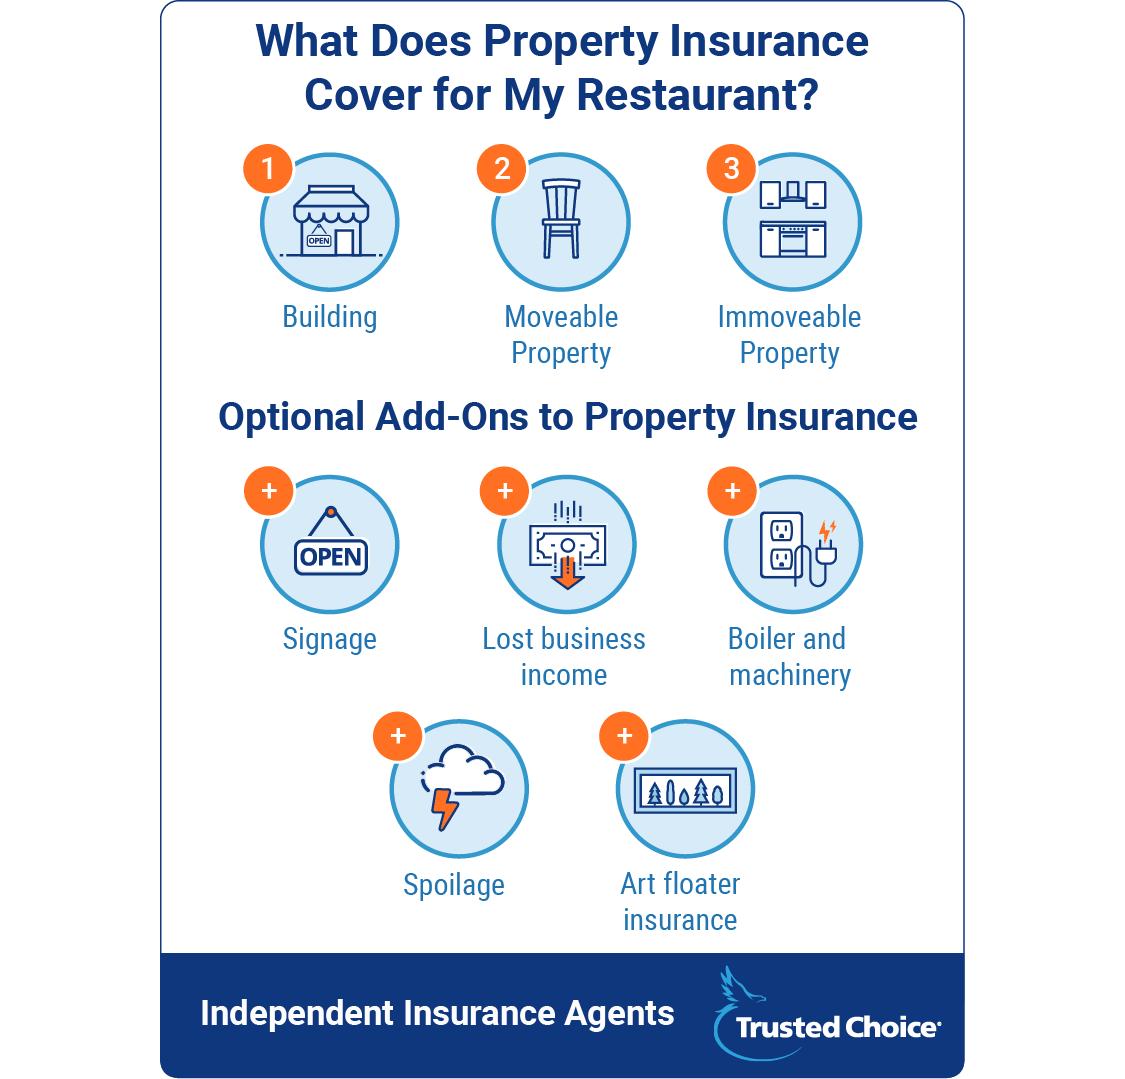 Texas restaurant property insurance